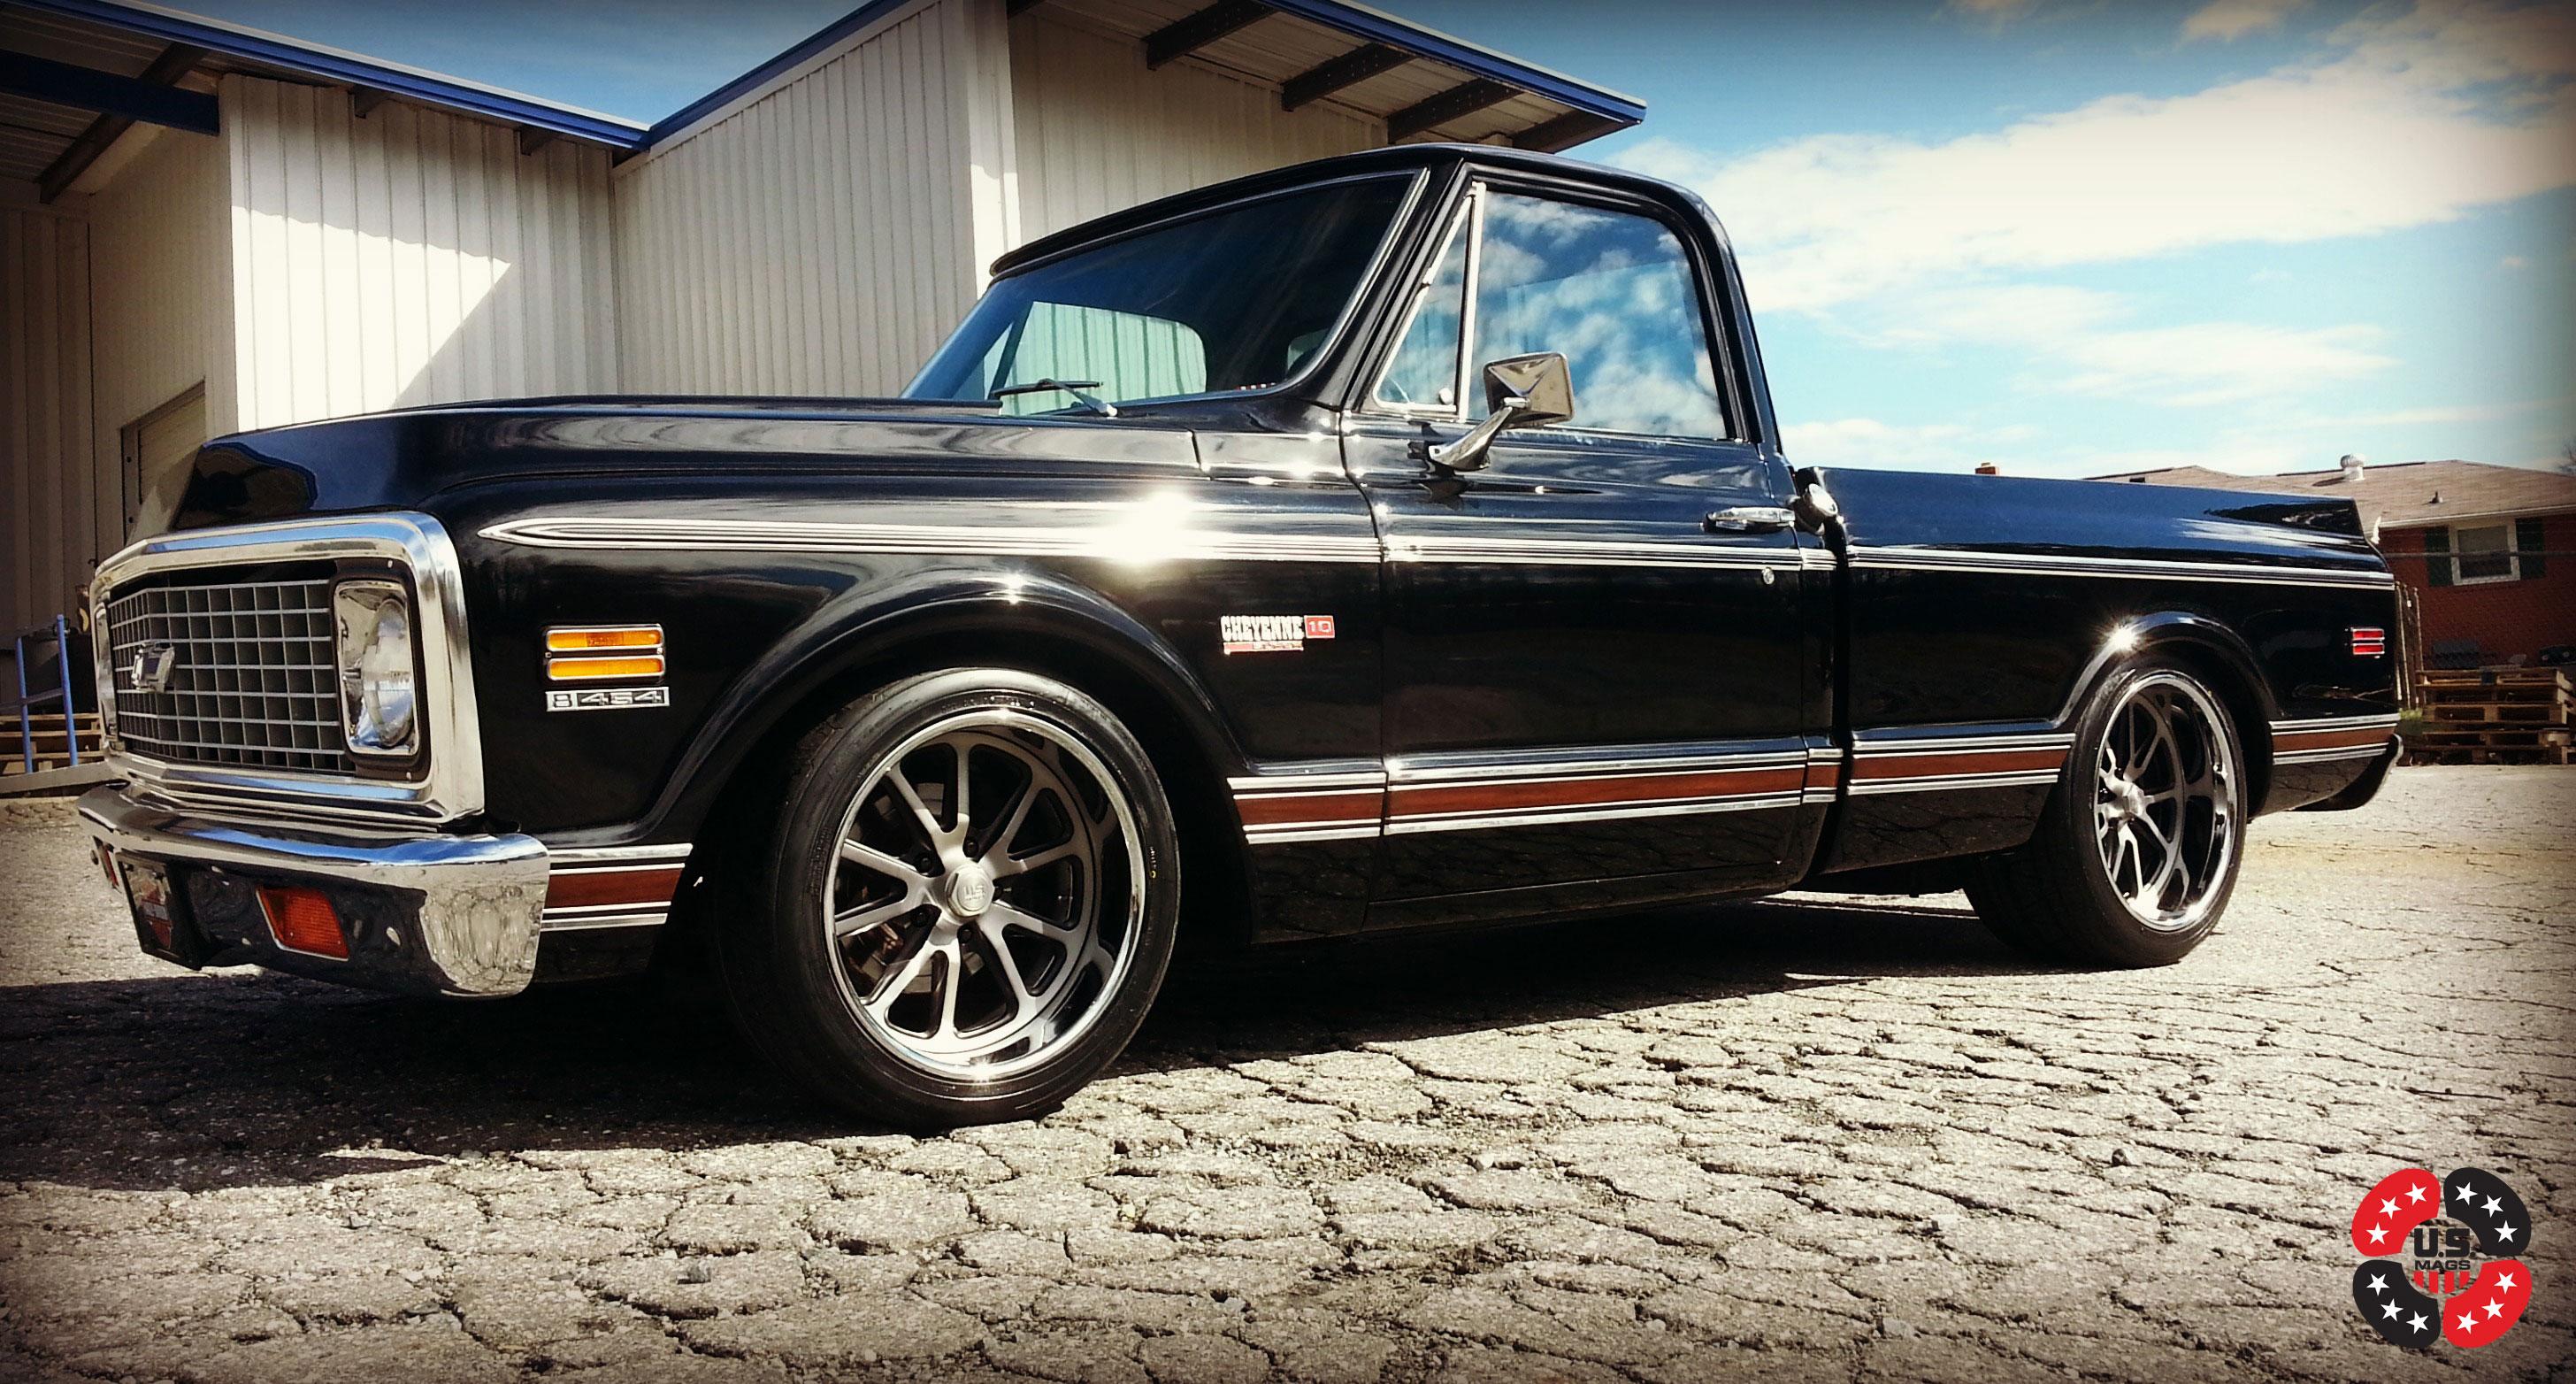 2017 Chevy Cheyenne >> Chevrolet Cheyenne Rambler - U425 Gallery - MHT Wheels Inc.